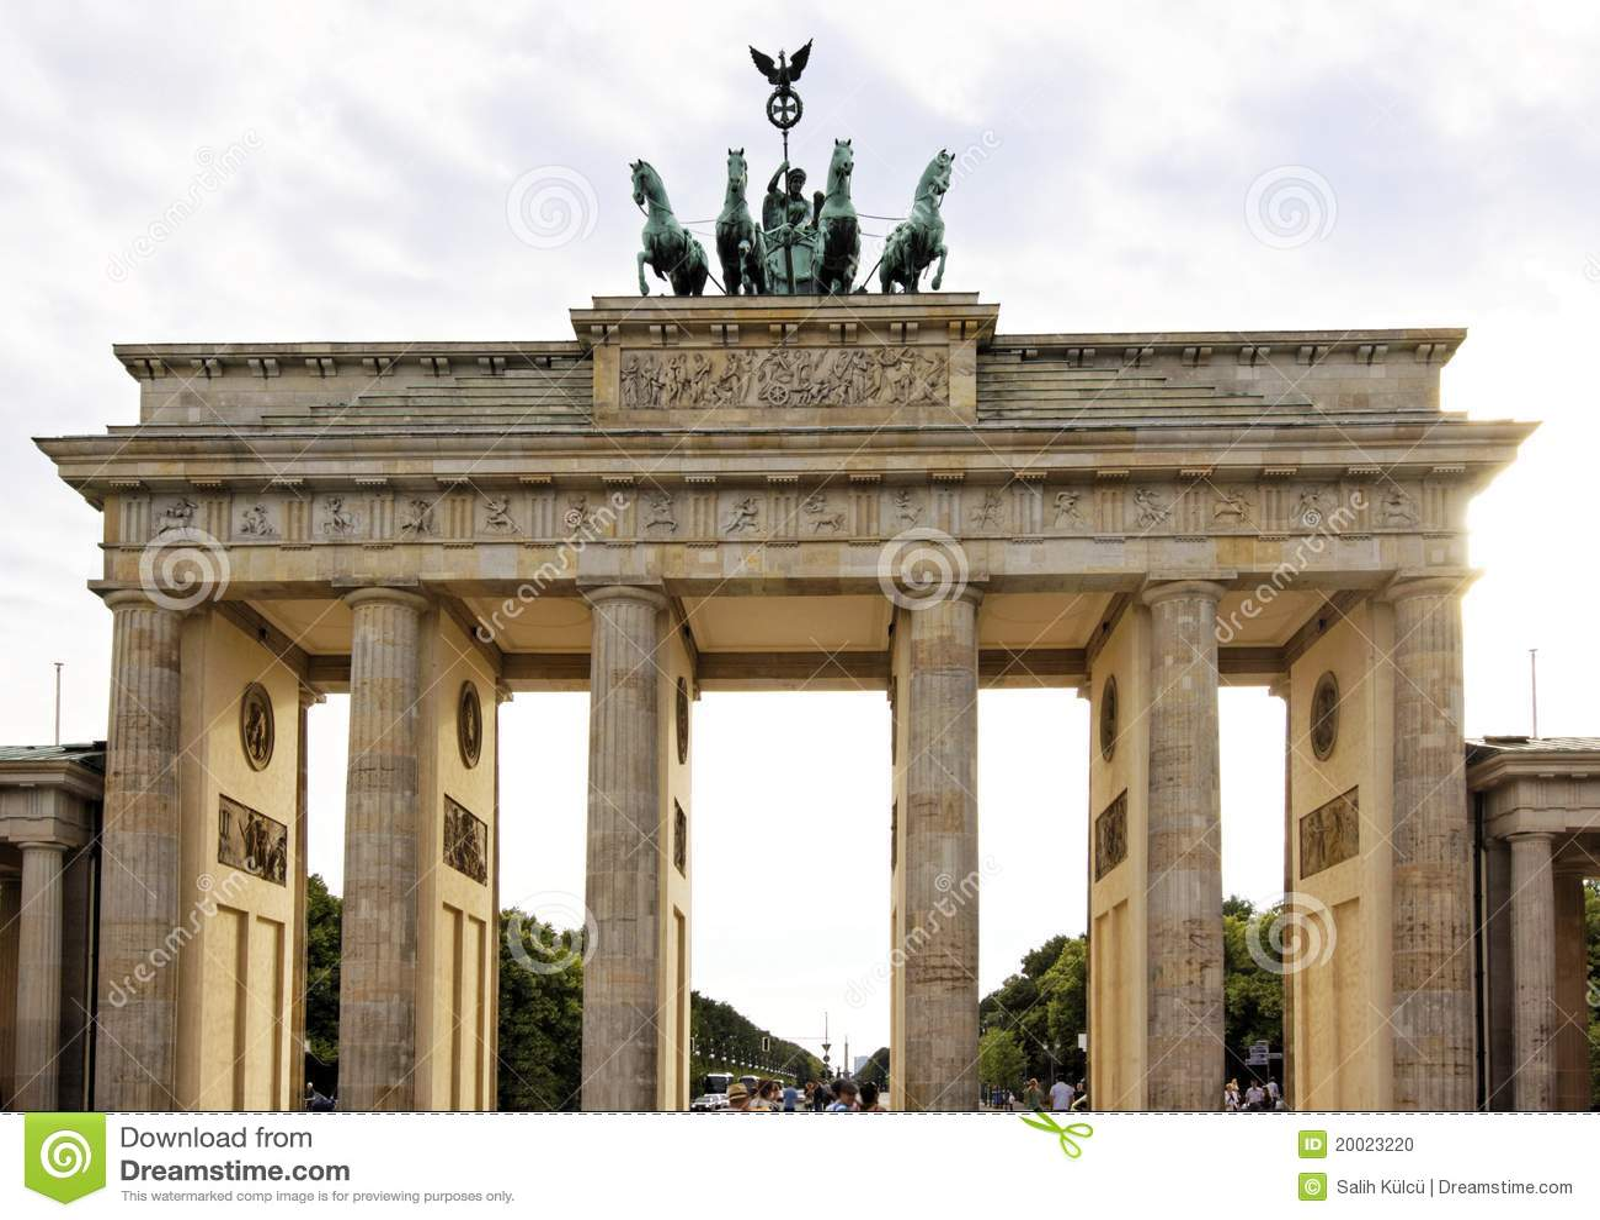 Berlin The Brandenburg Gate Stock Photo Image 20023220